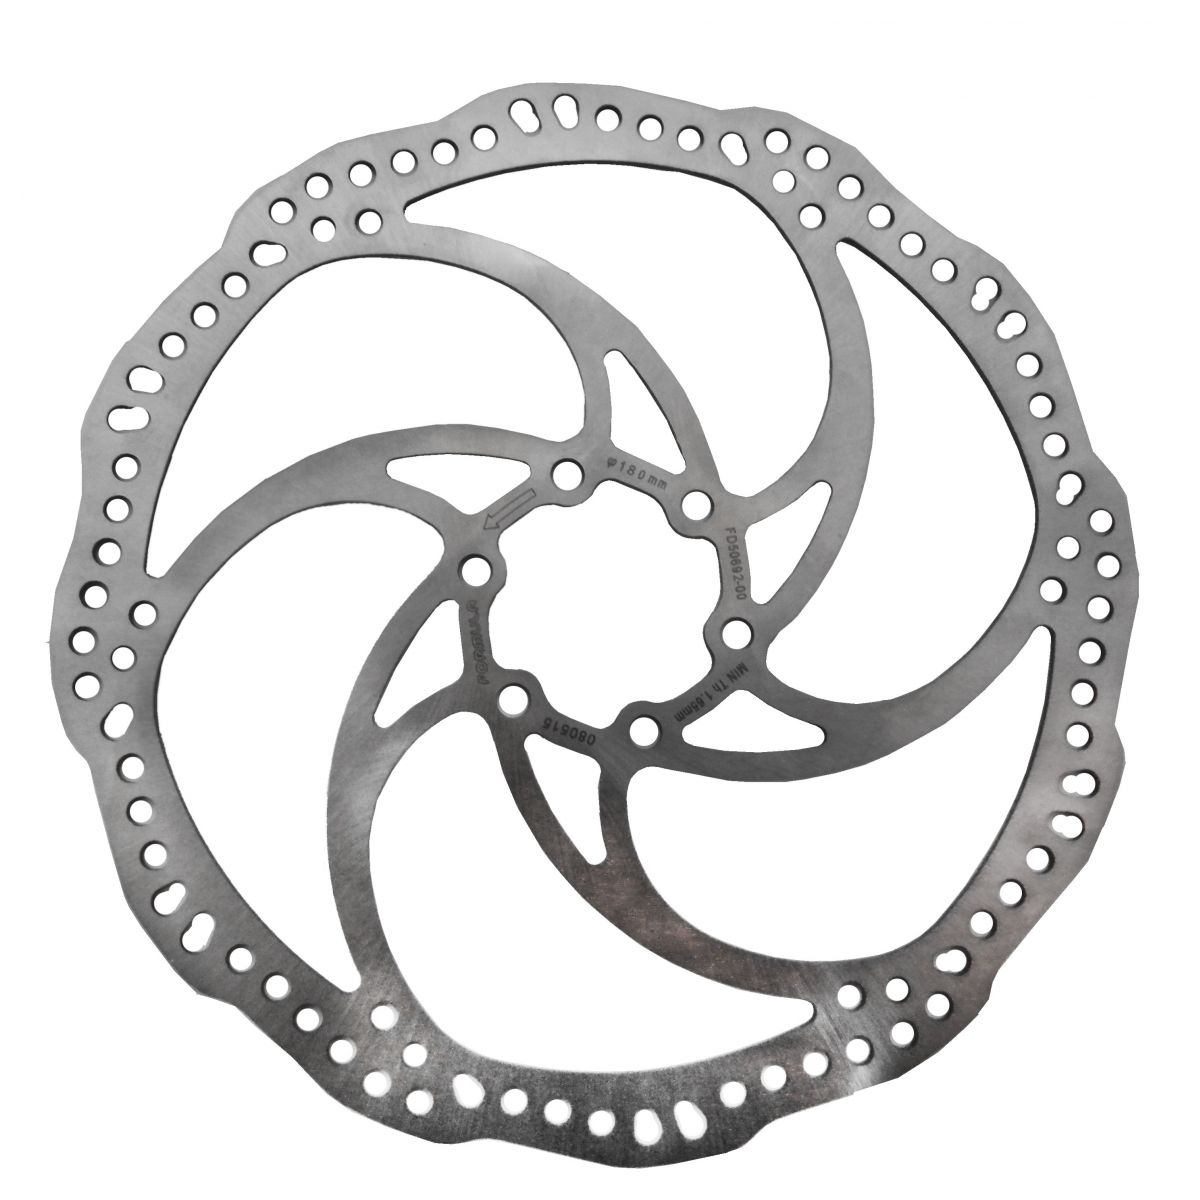 Disco / Rotor Calypso 180mm